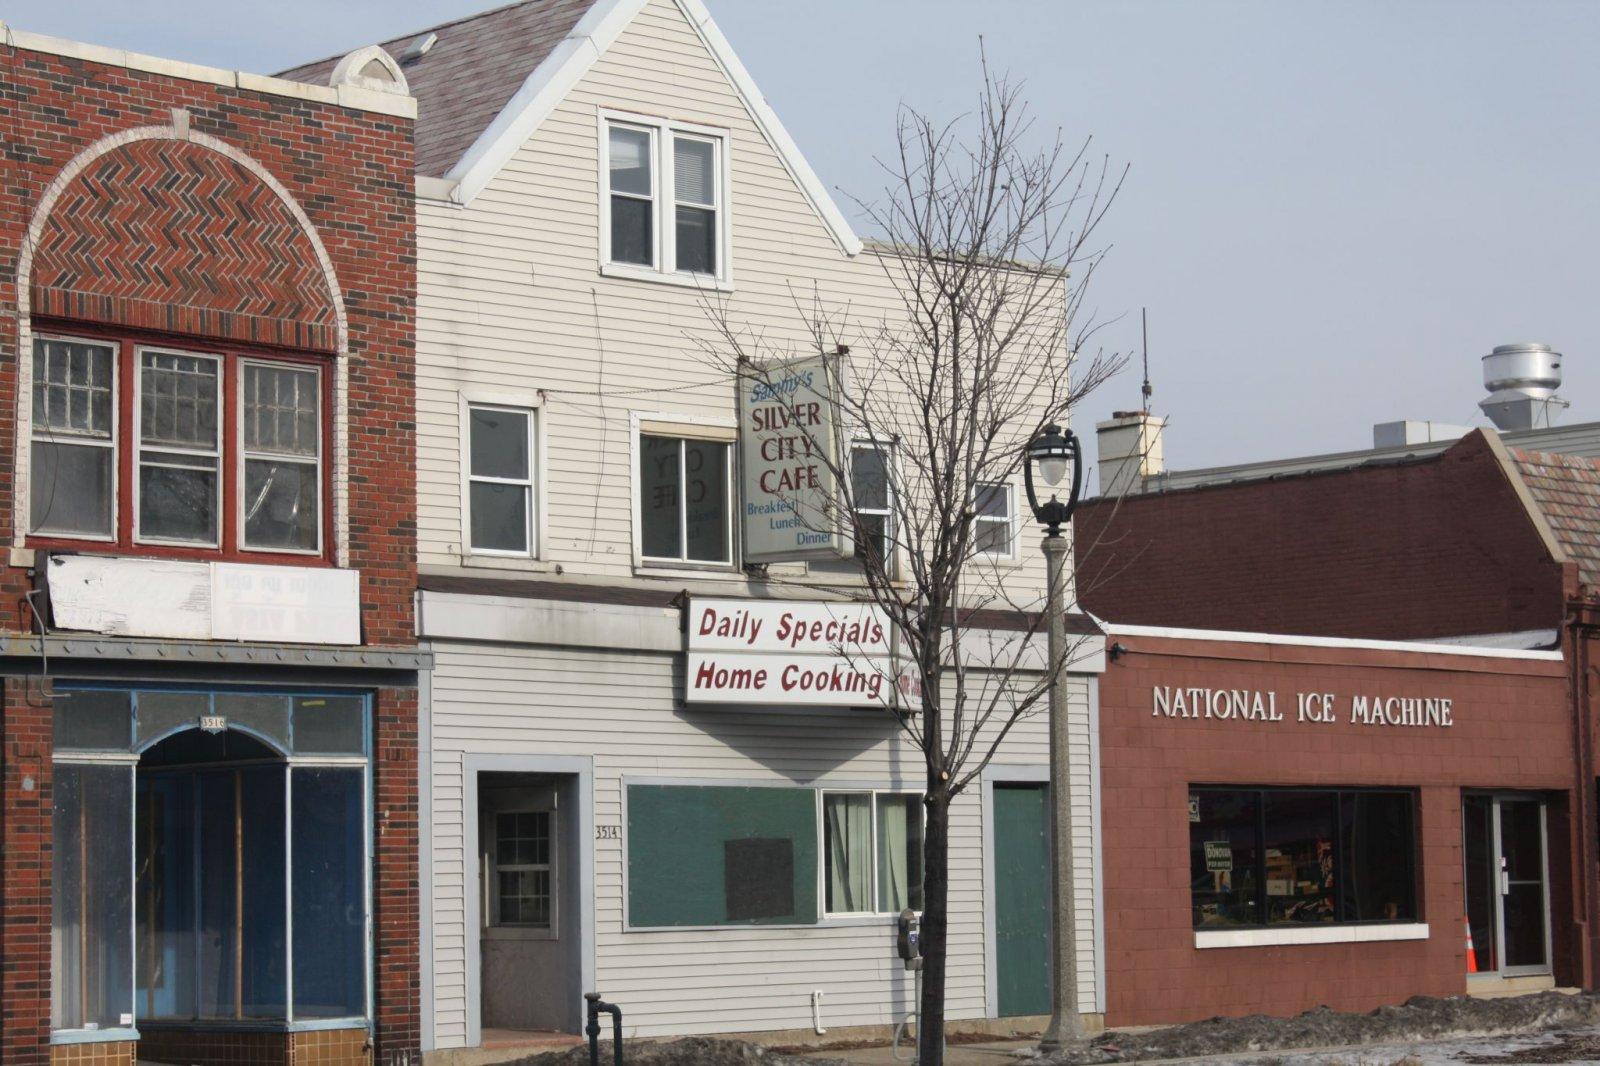 National Avenue runs through the Silver City Neighborhood